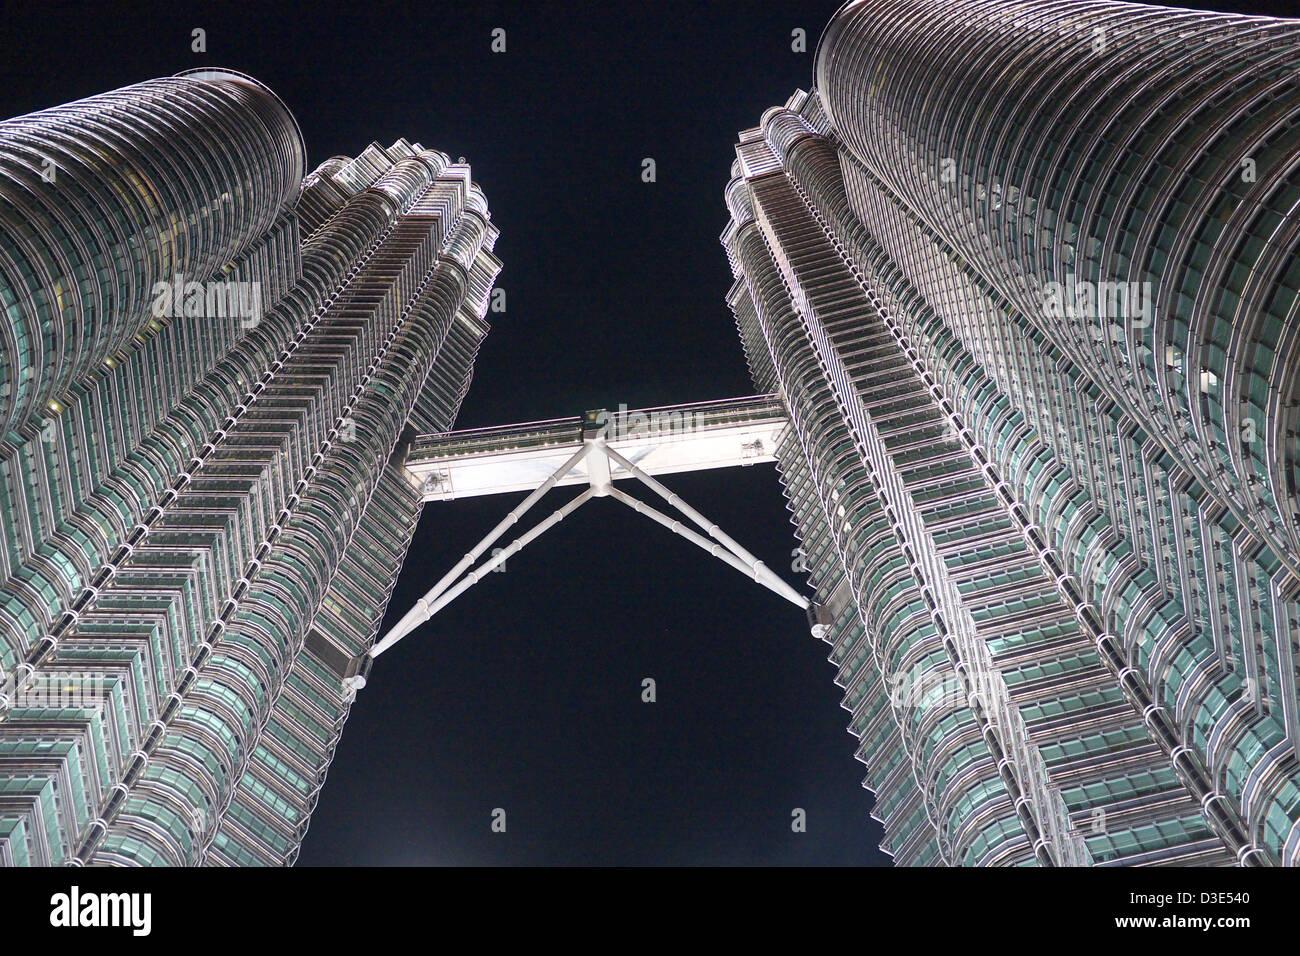 Petronas towers with pedestrian bridge between towers, at night - Stock Image